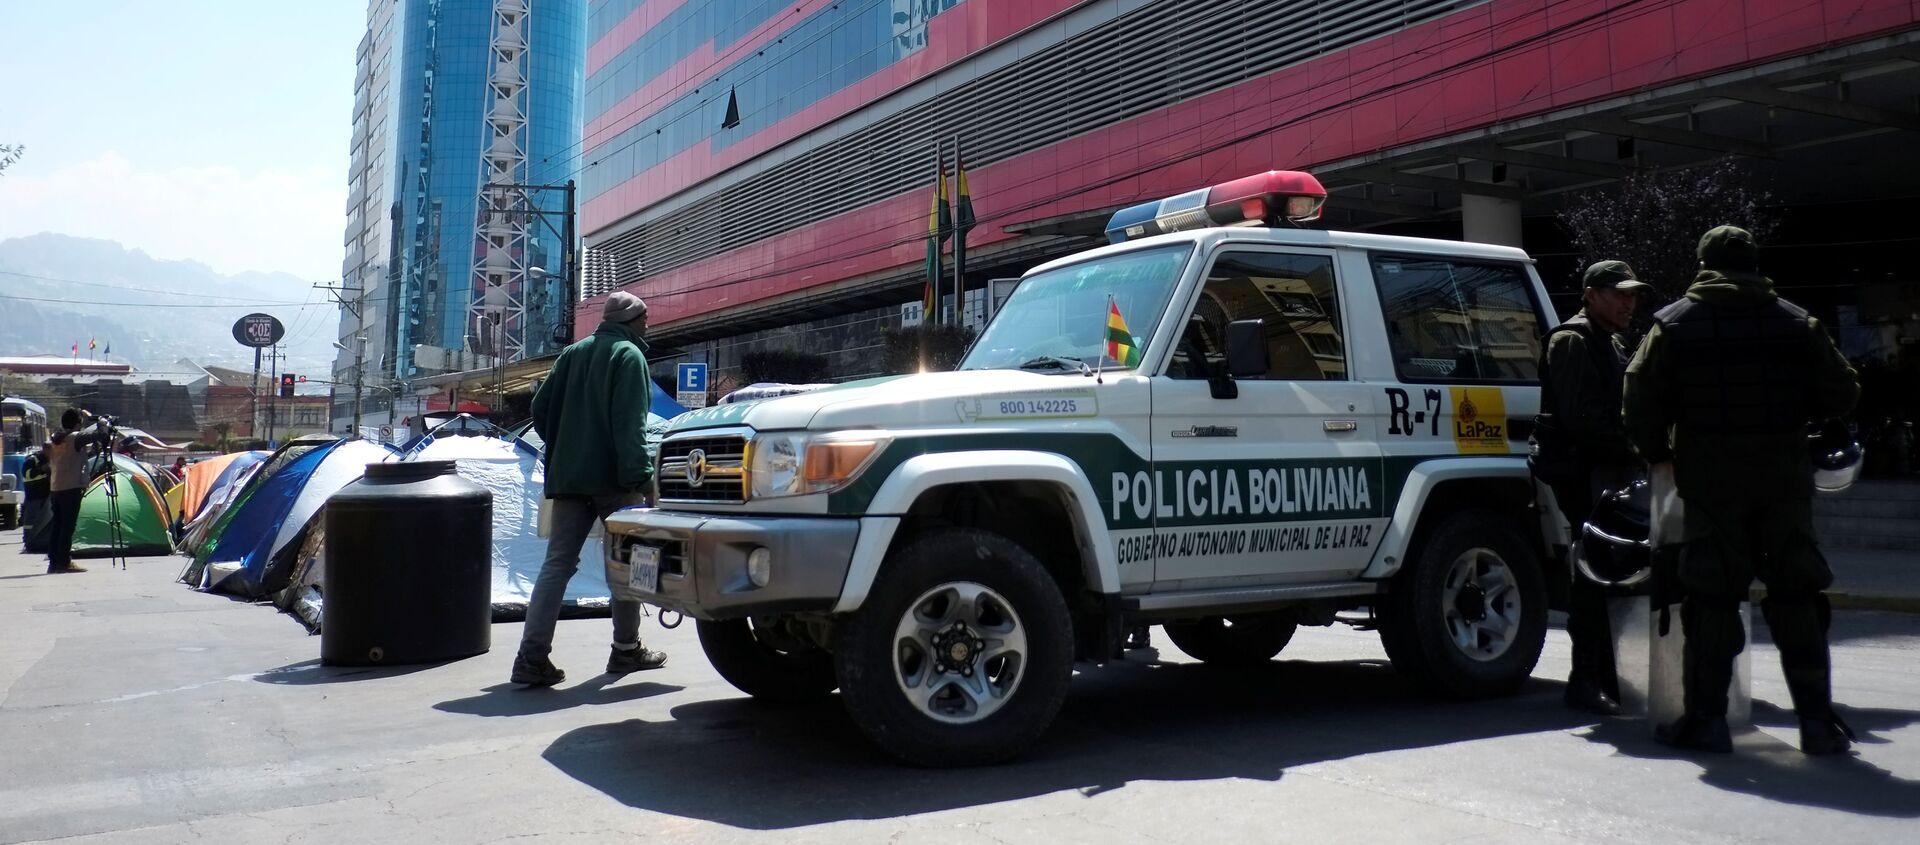 La Policía boliviana - Sputnik Mundo, 1920, 20.11.2020